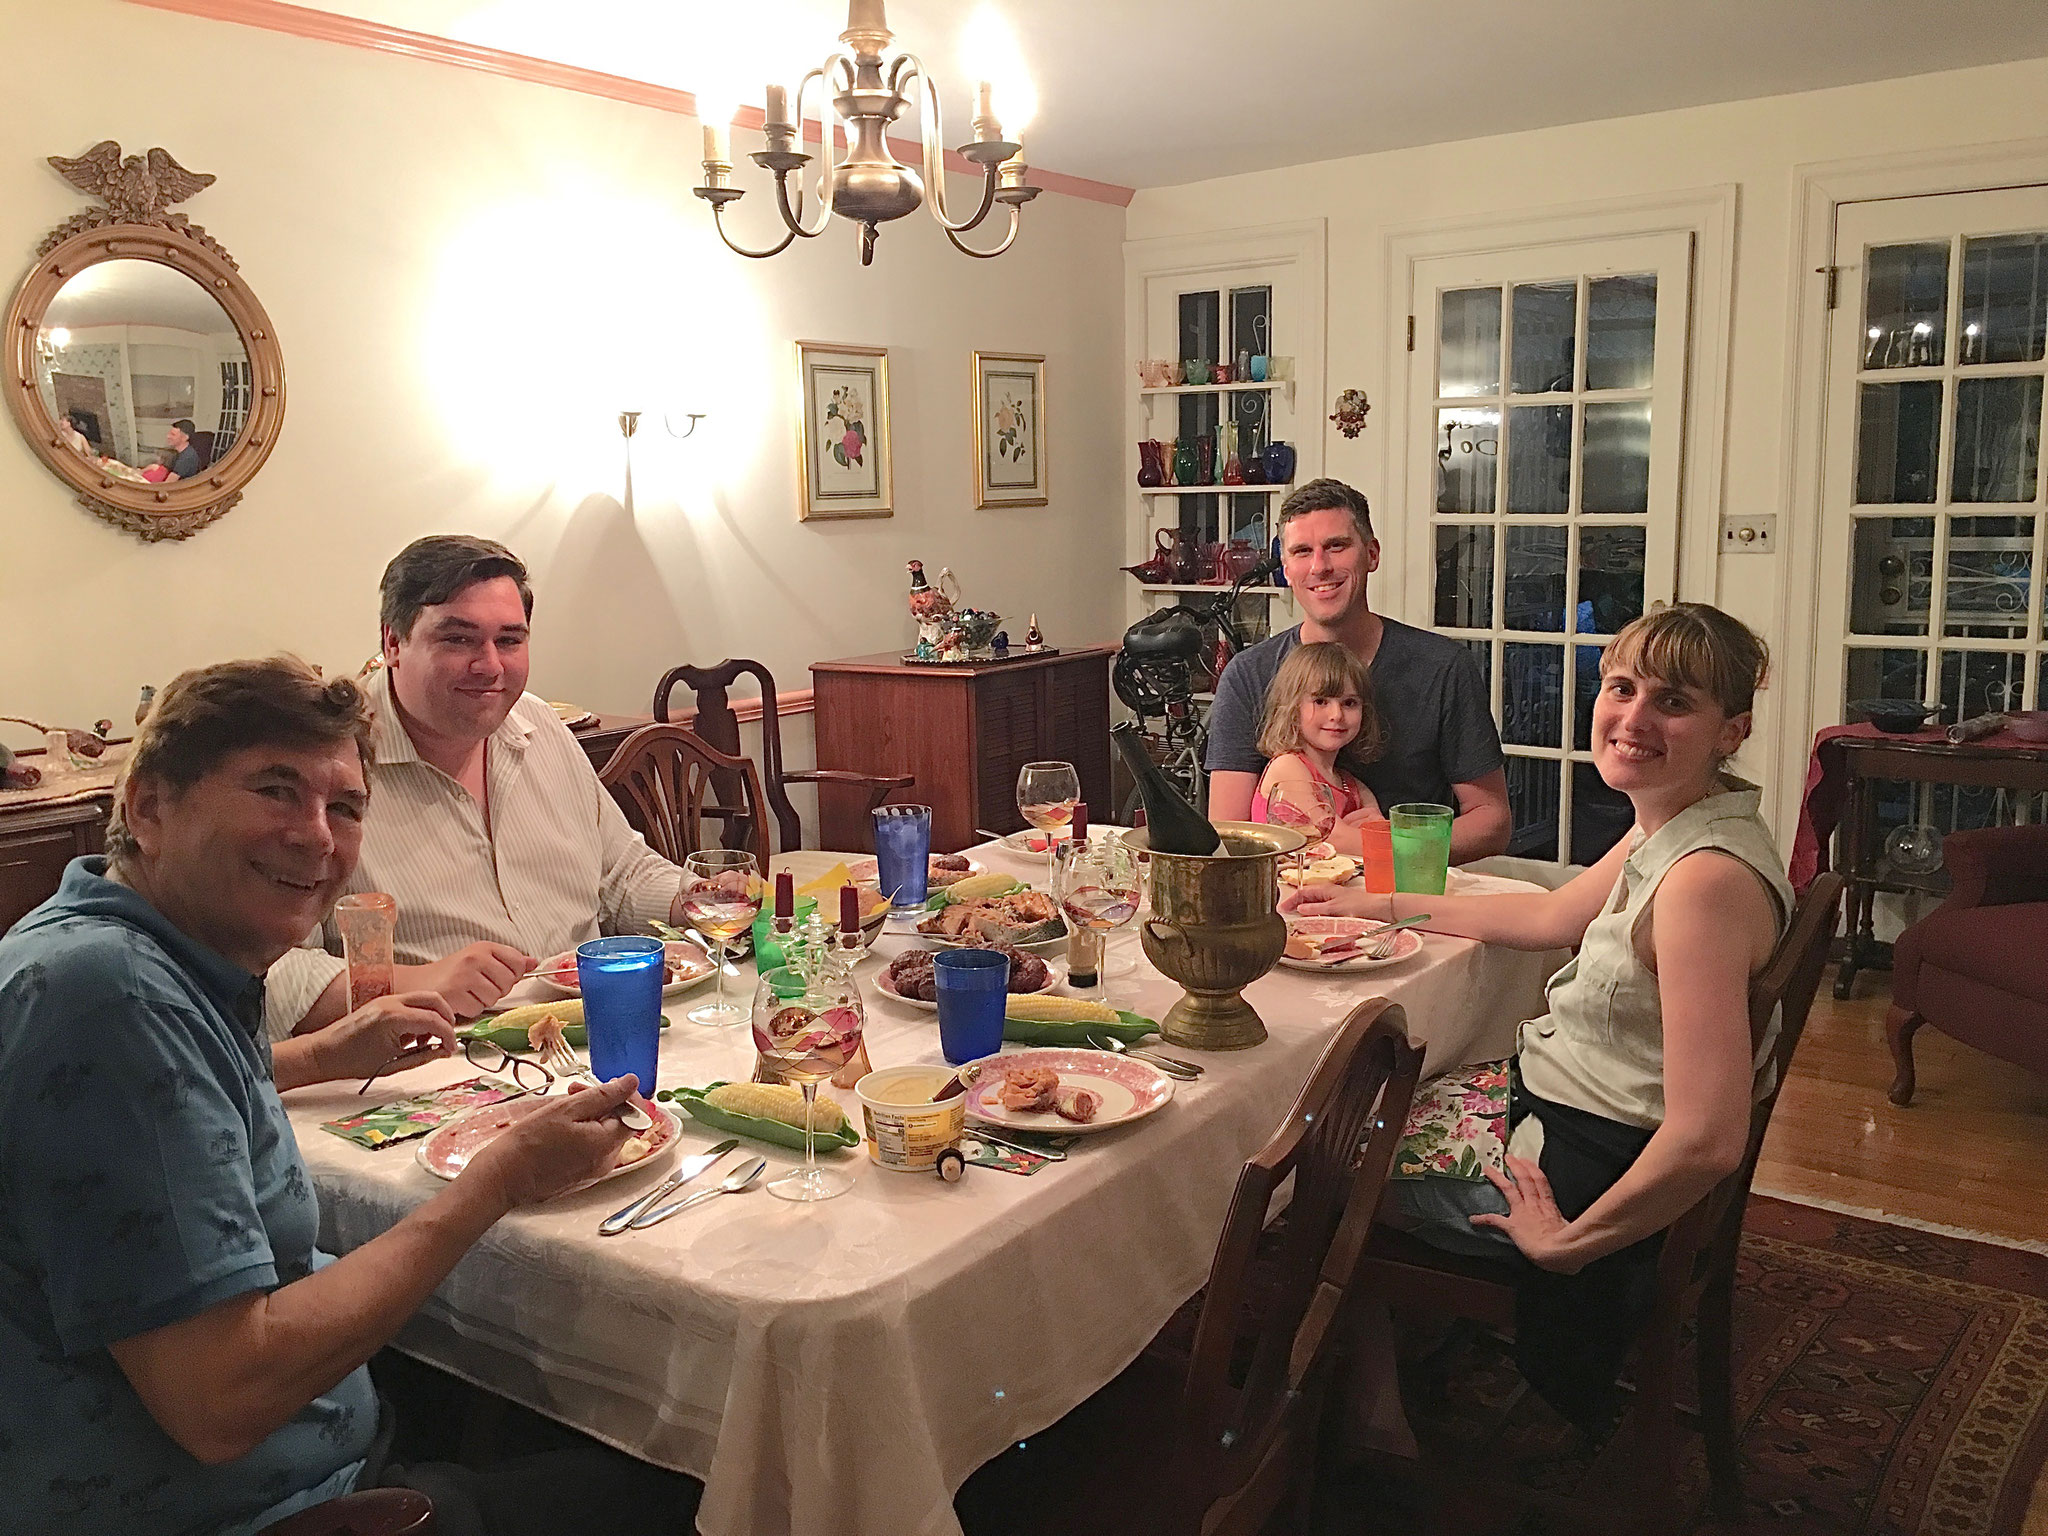 John, Greg, Patrick & Celine, Anna Groner NYC, July, 2019